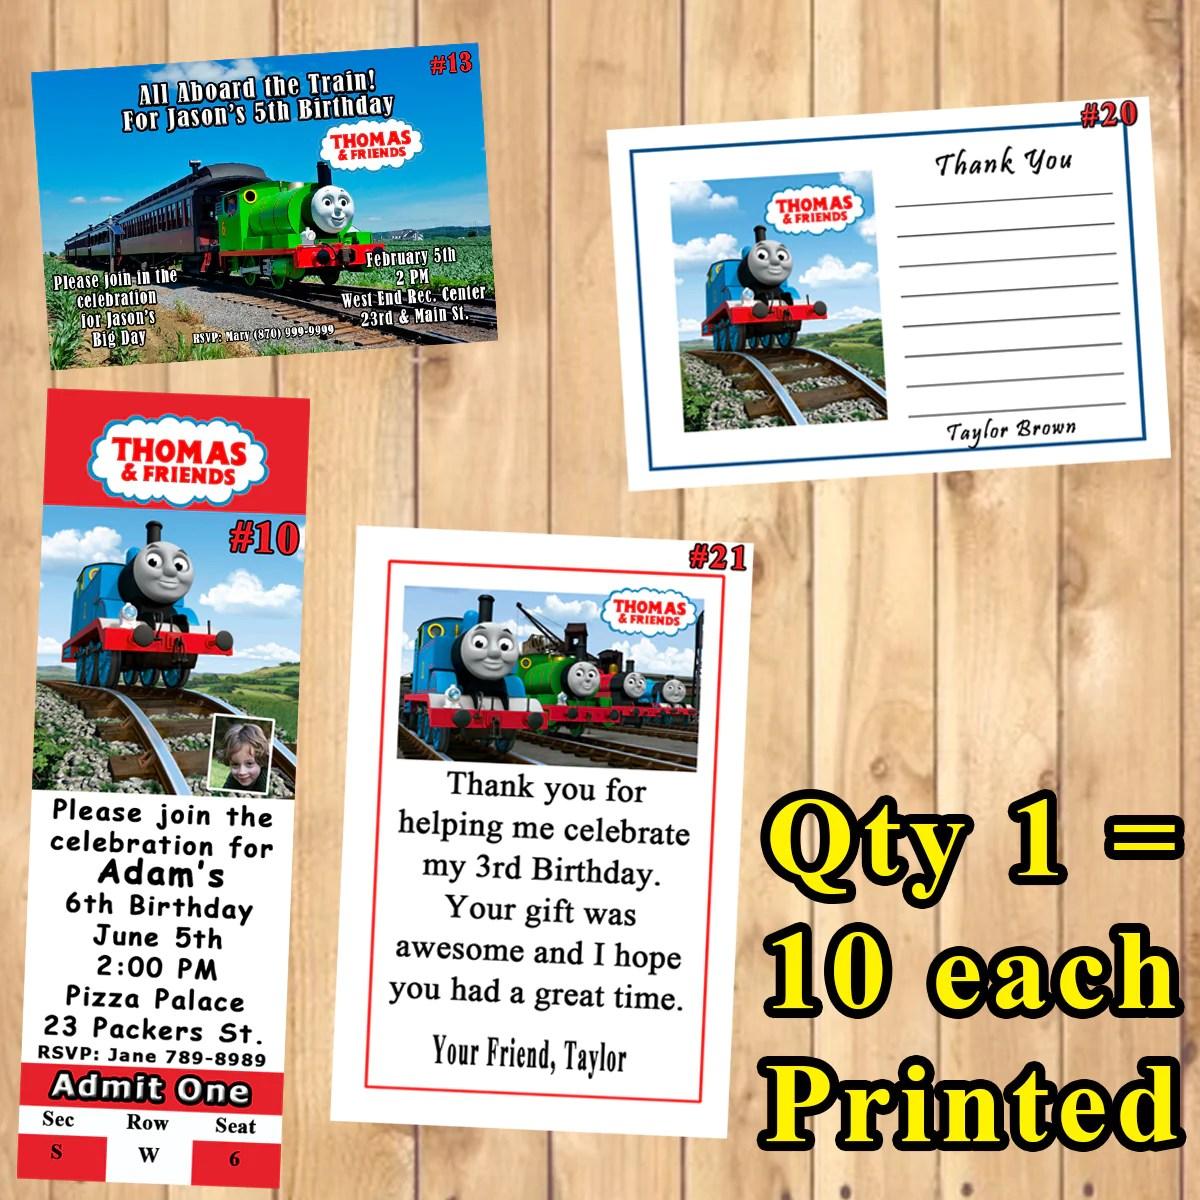 thomas the train thomas and friends birthday invitations printed 10 ea virginia design shop